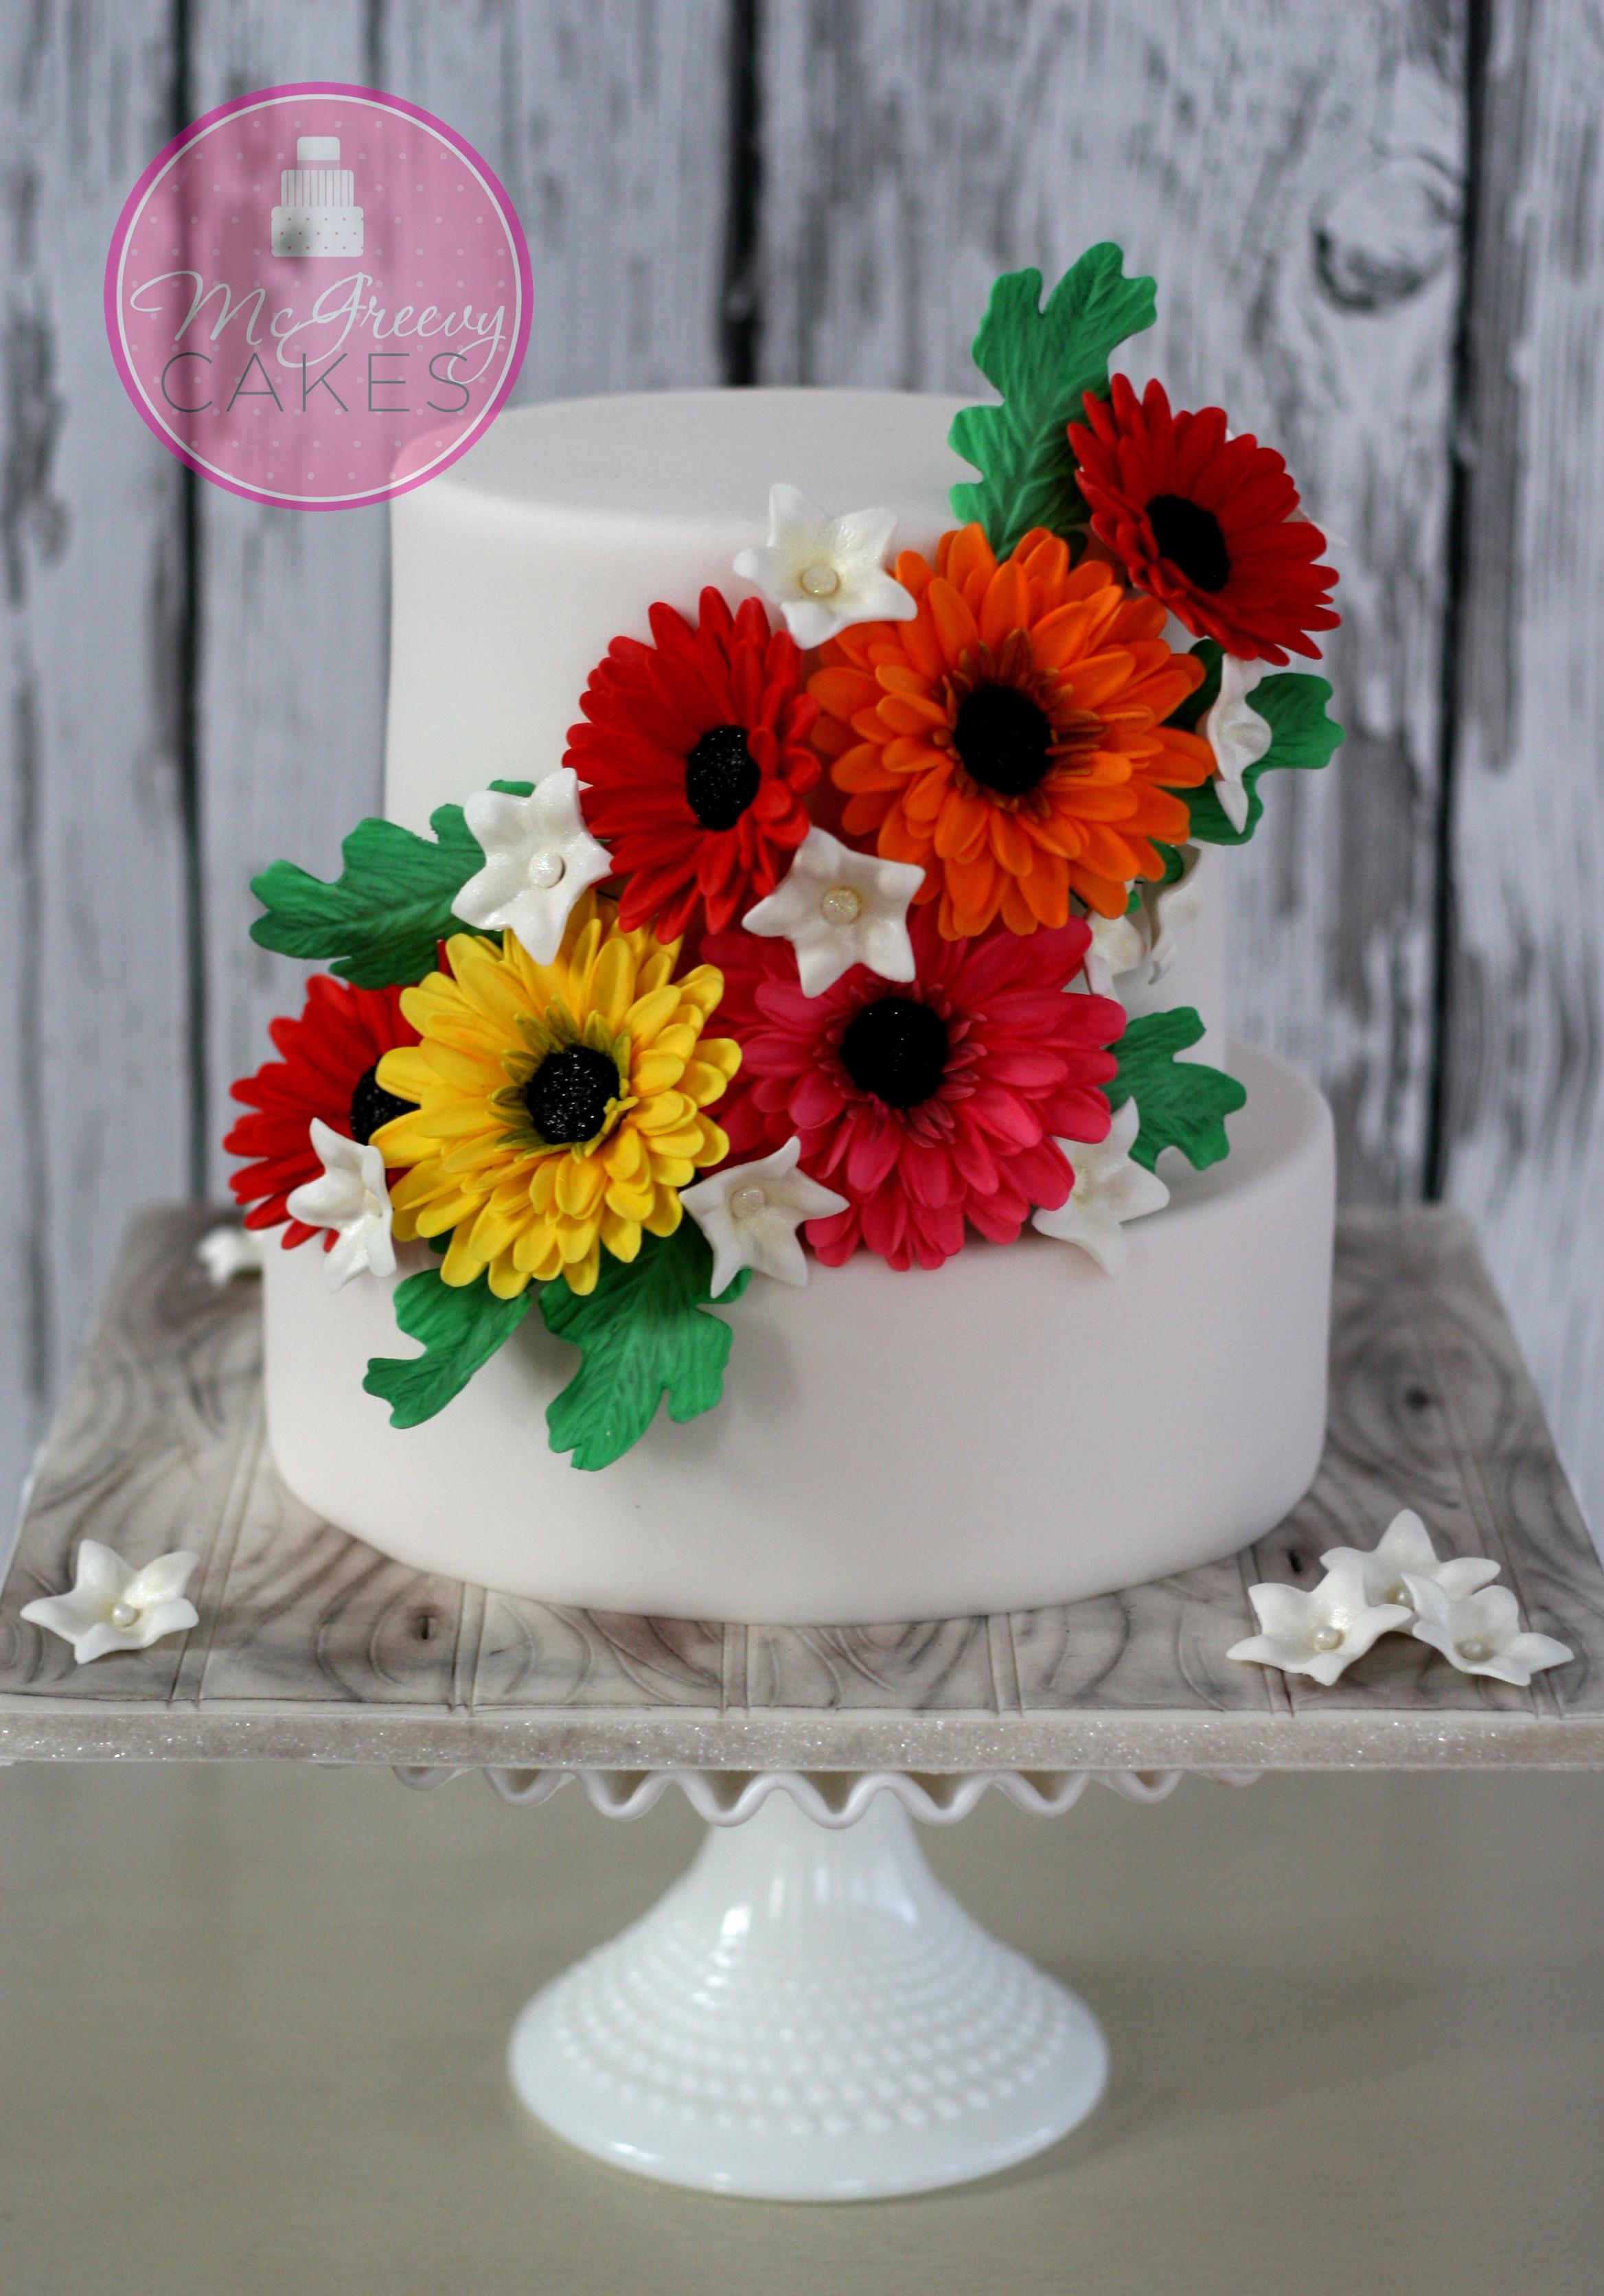 Gerber Daisy Birthday Cake Pic